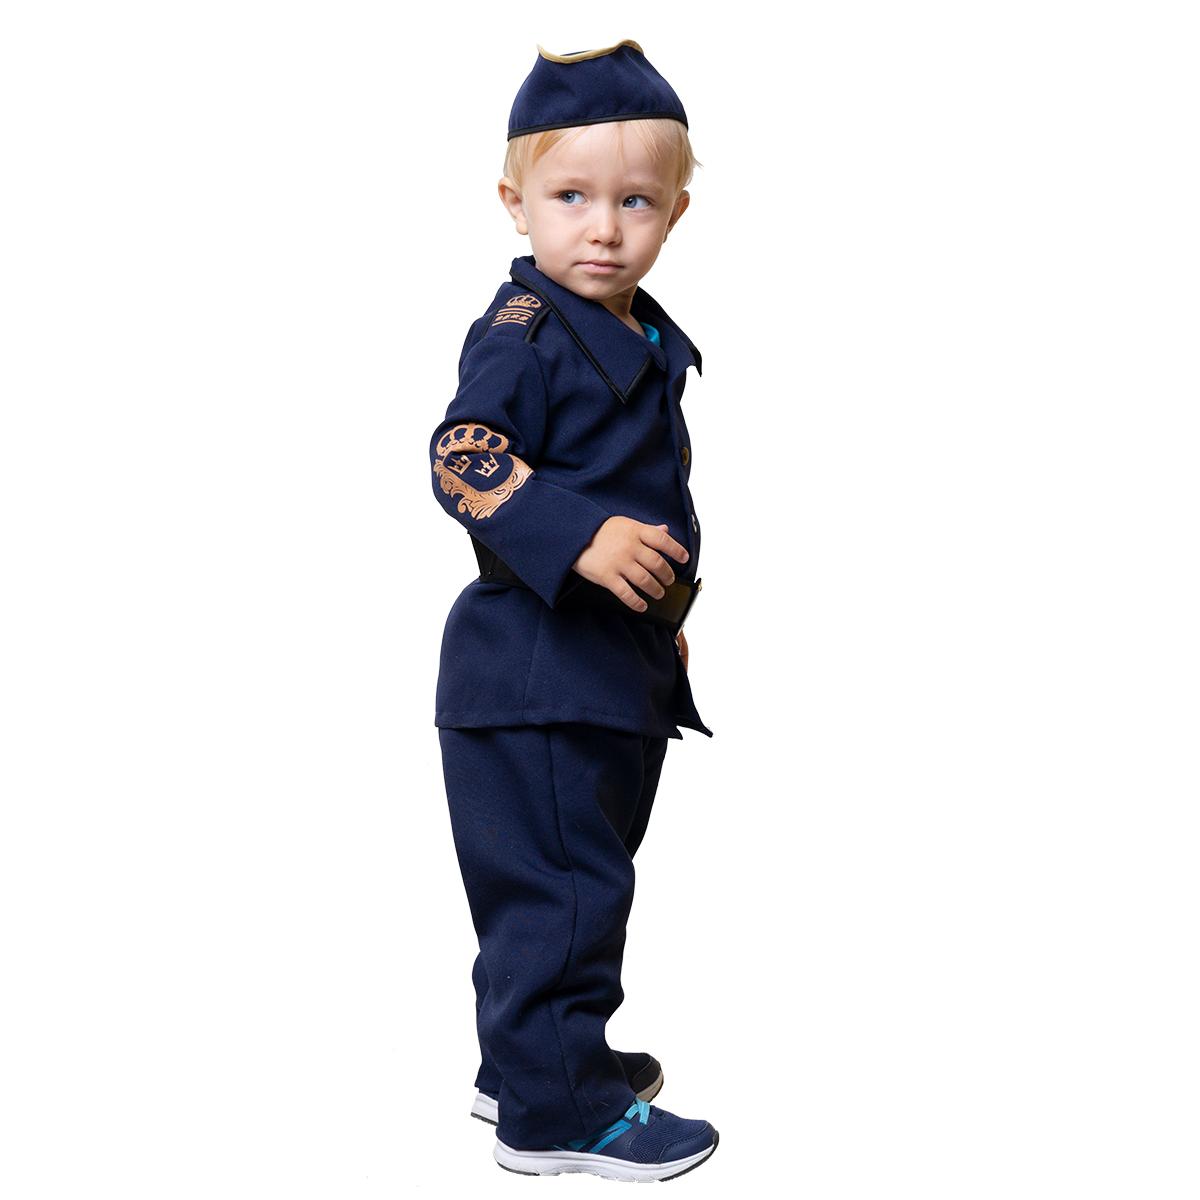 pojke i polisdräkt